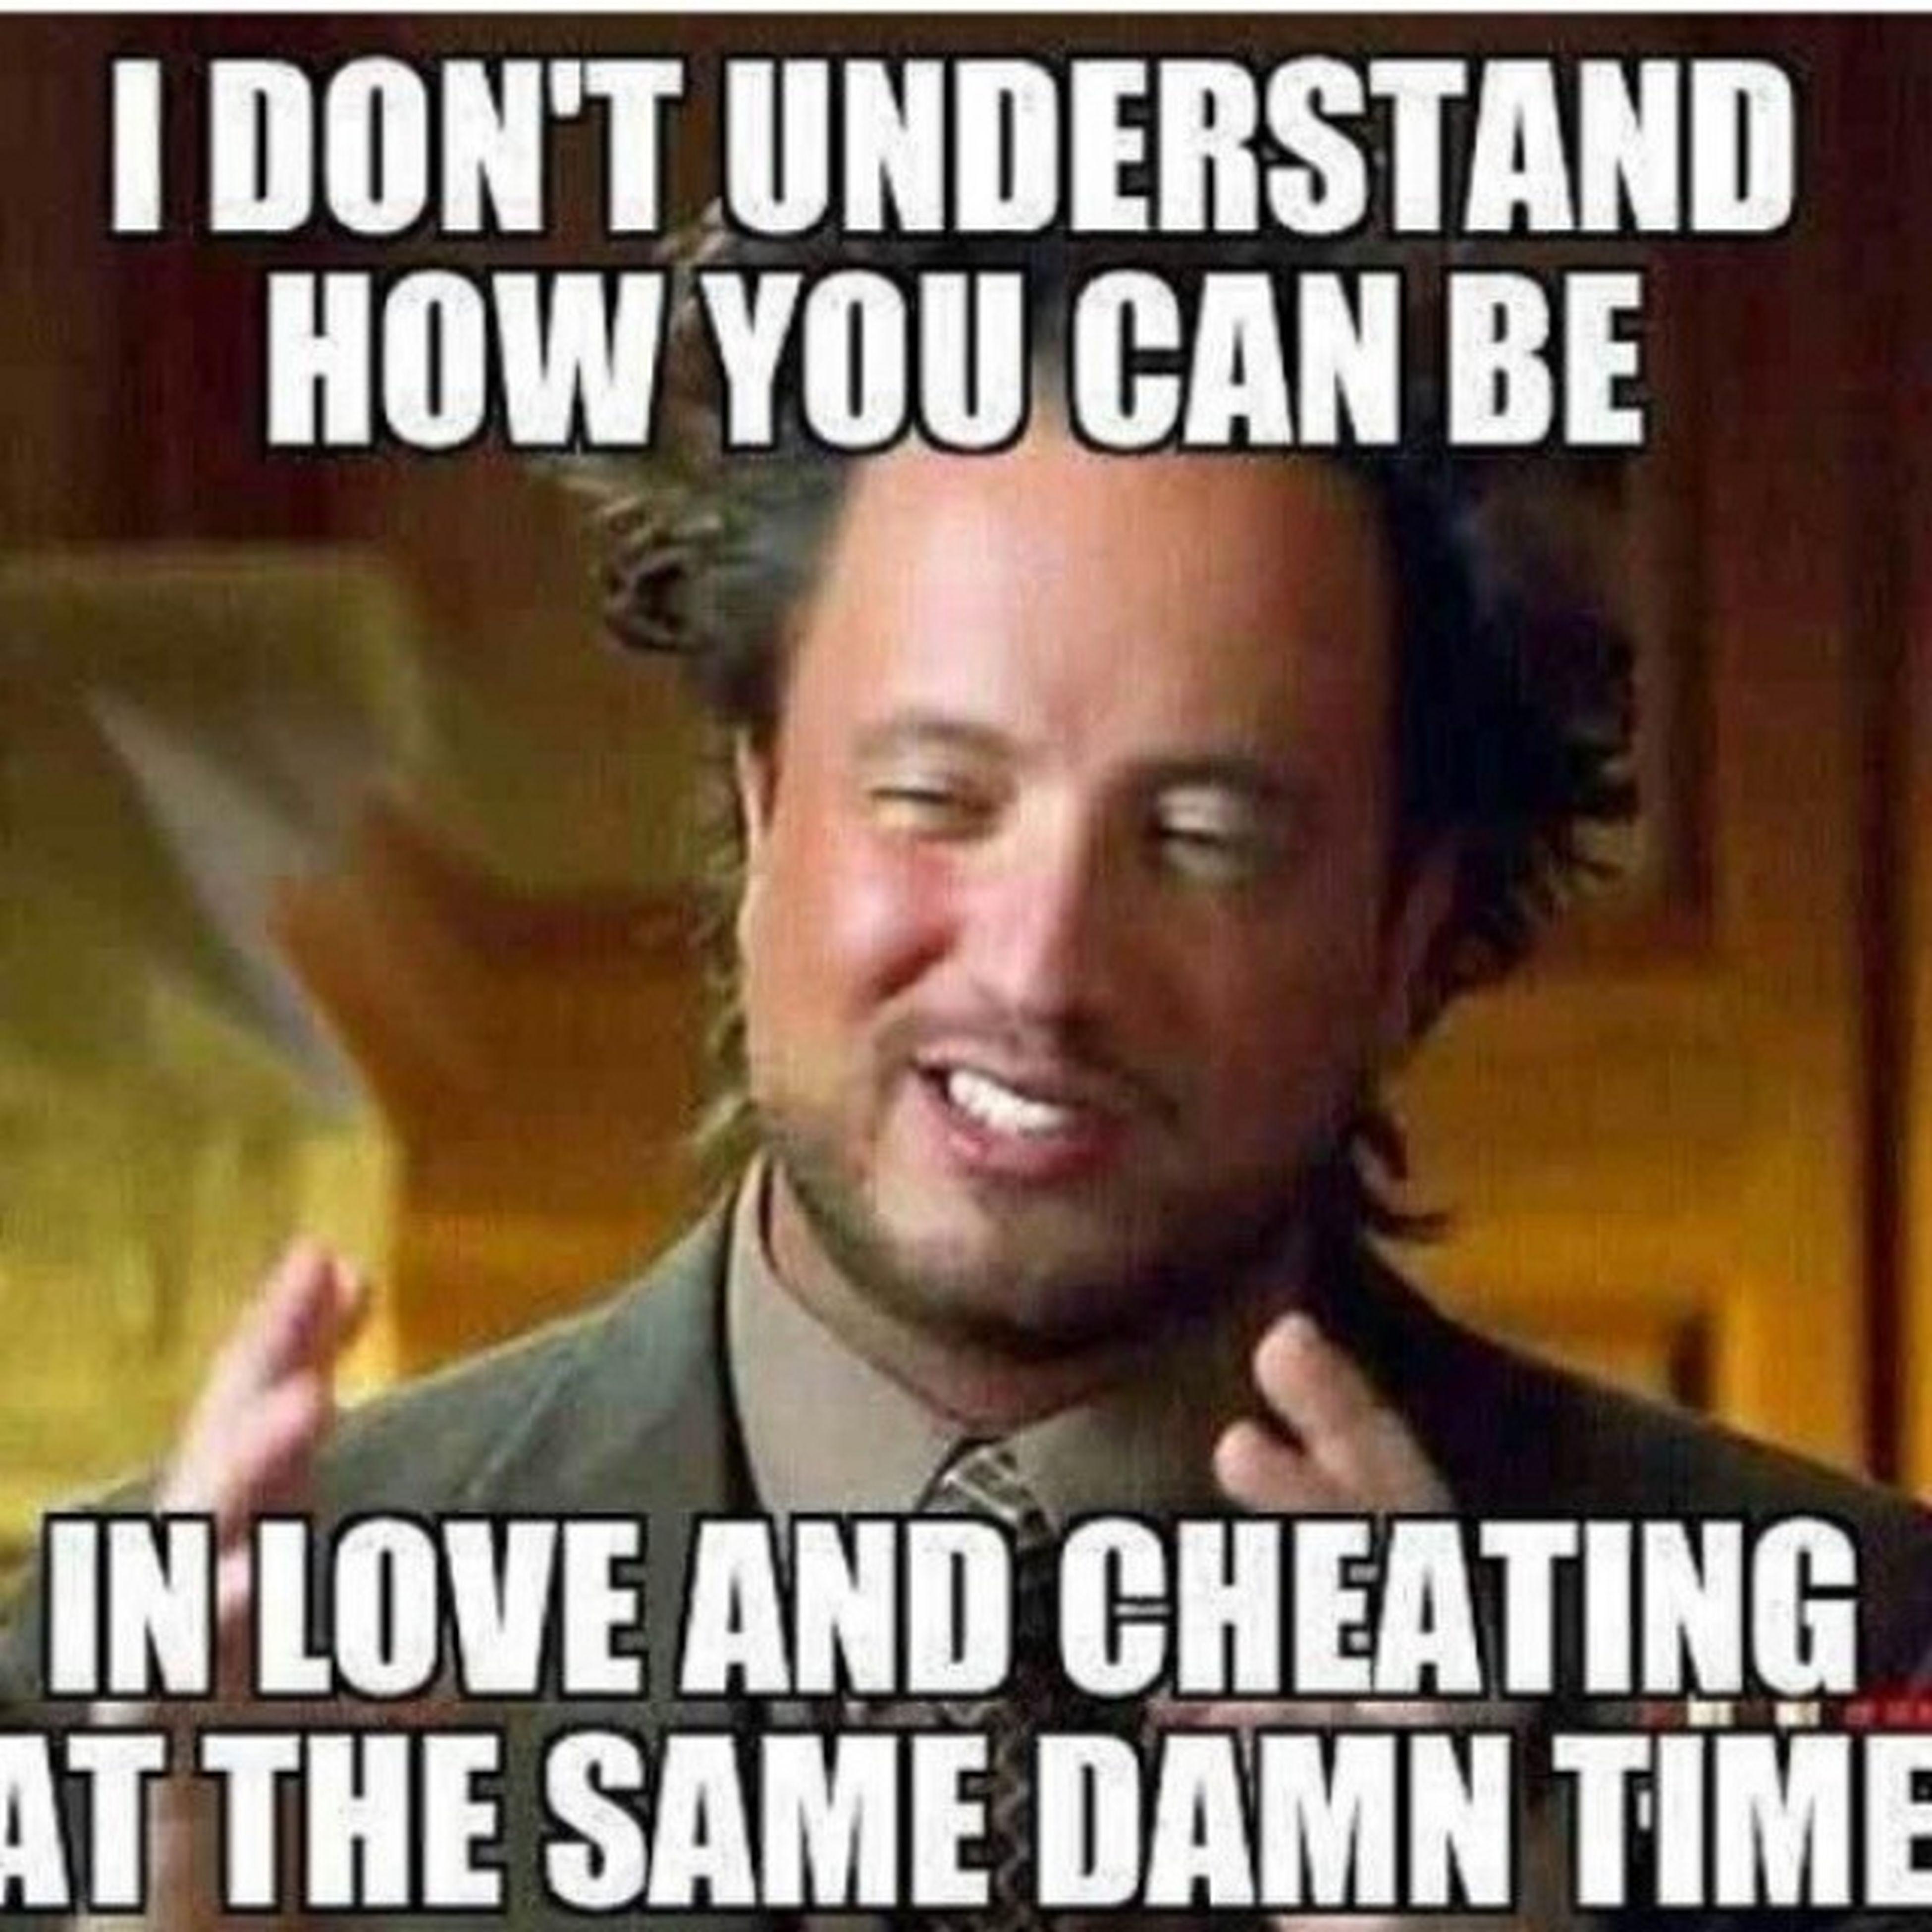 Hahahaha ThatsWhatImSayin Forrealthough How Lmao